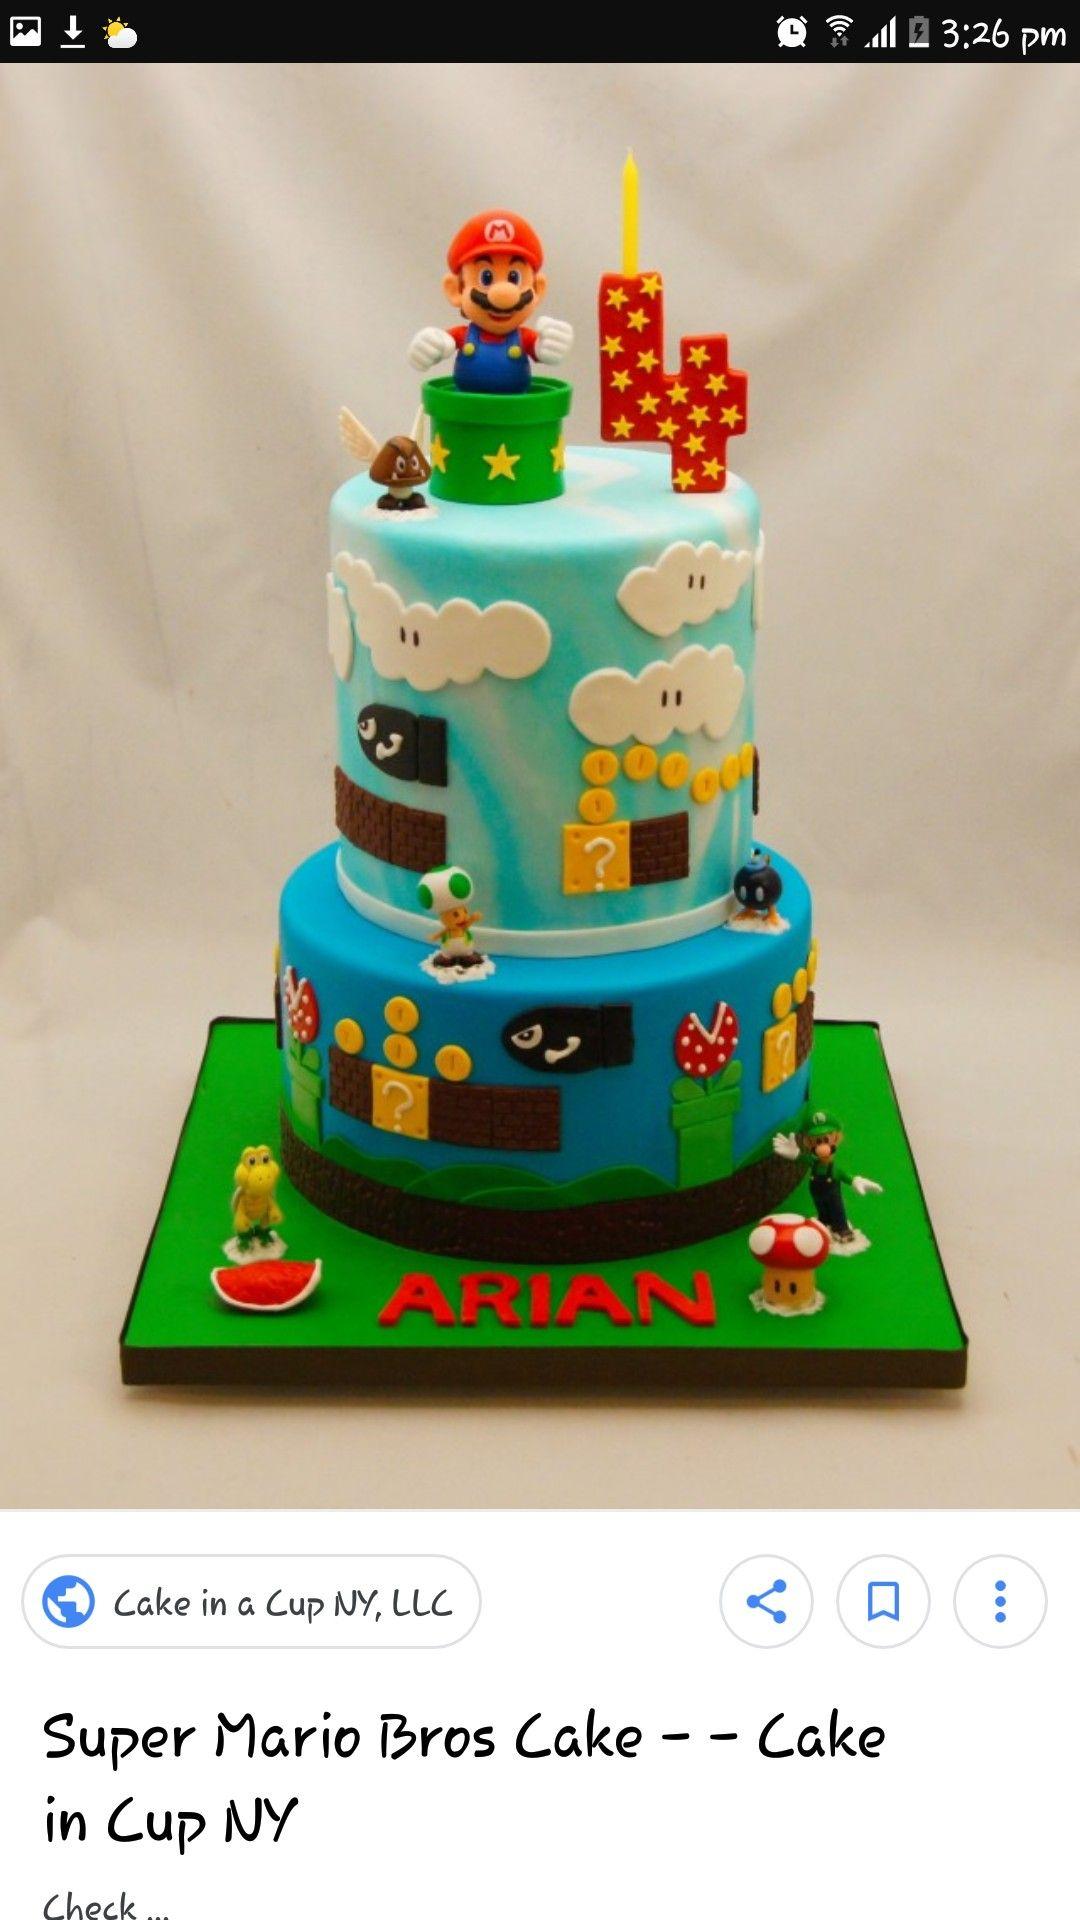 Pin by la maison du cake on Games Cakes Pinterest